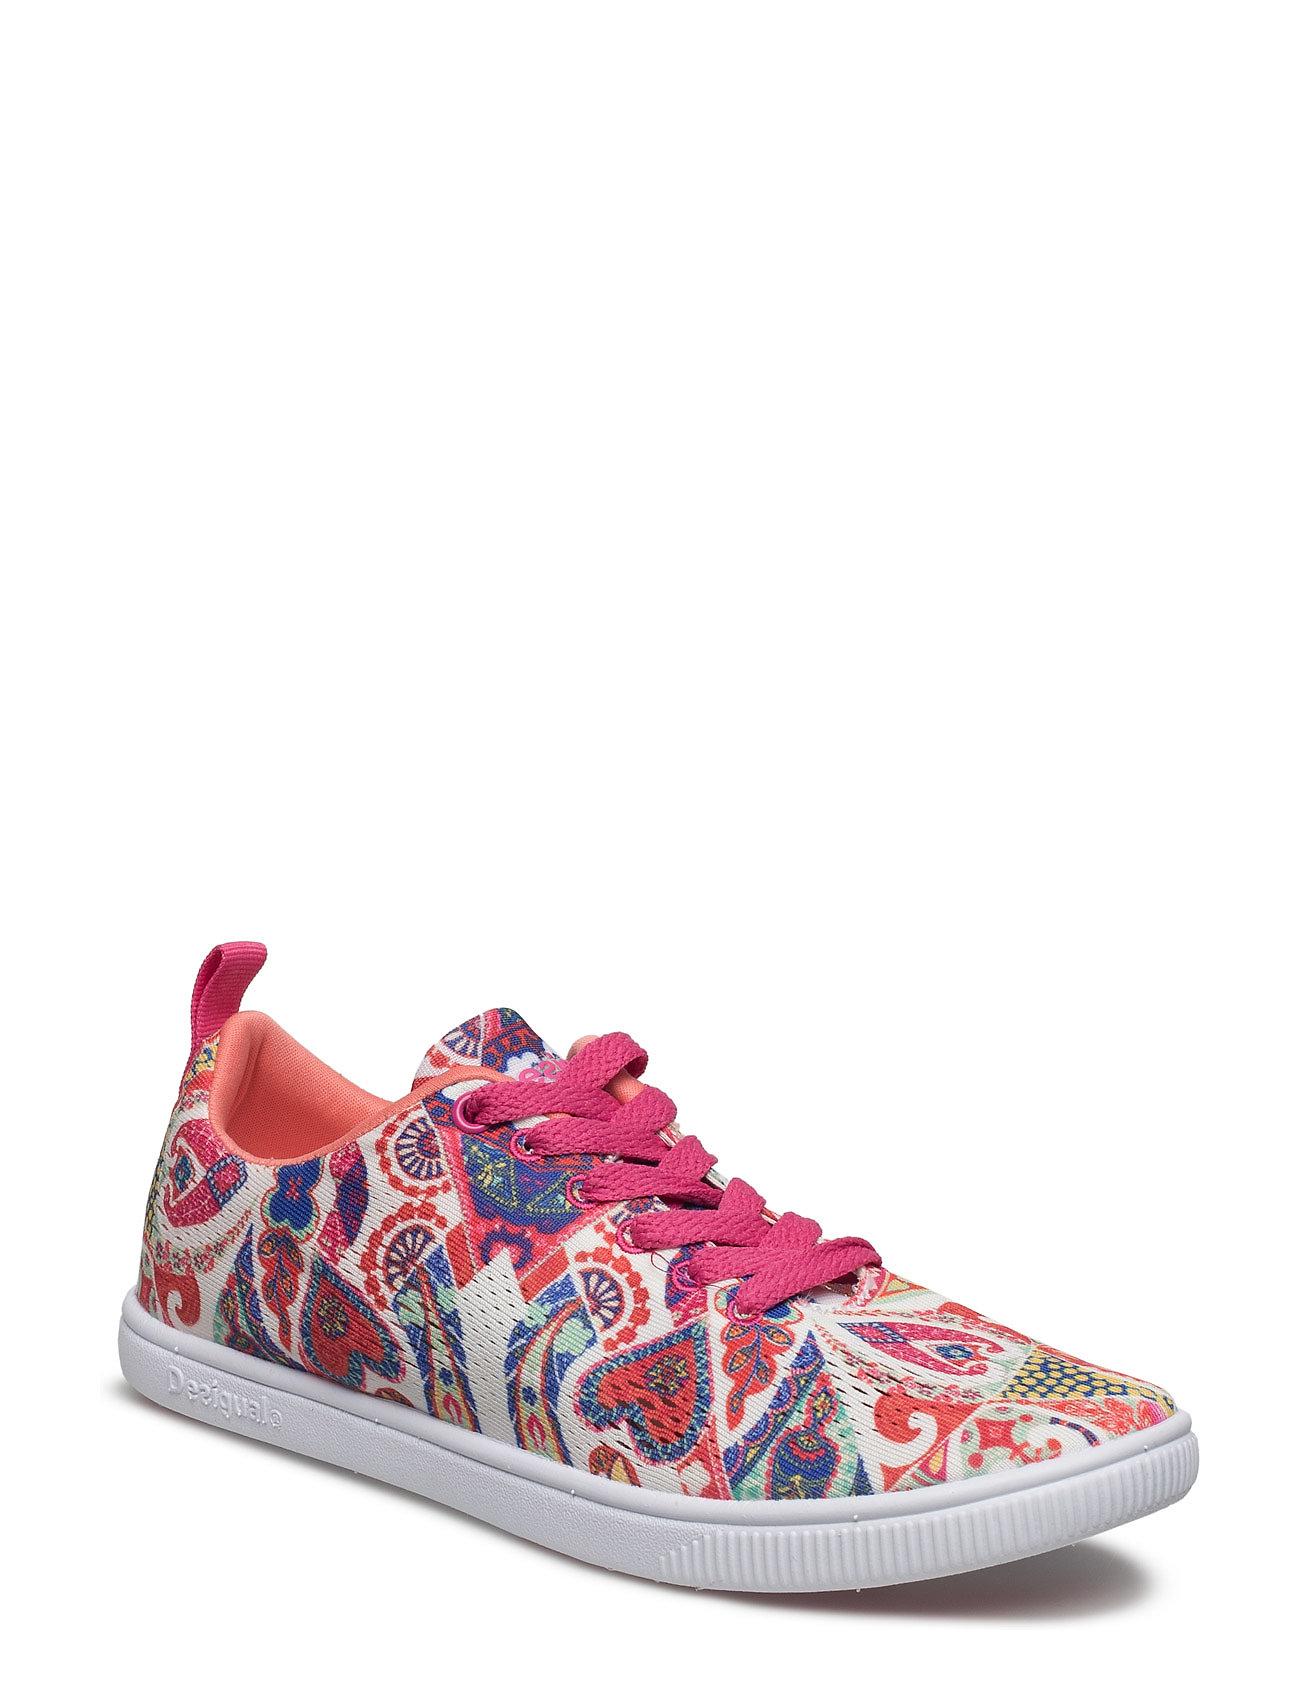 Shoes Camden Hearts Desigual Shoes Sneakers til Damer i Blanco